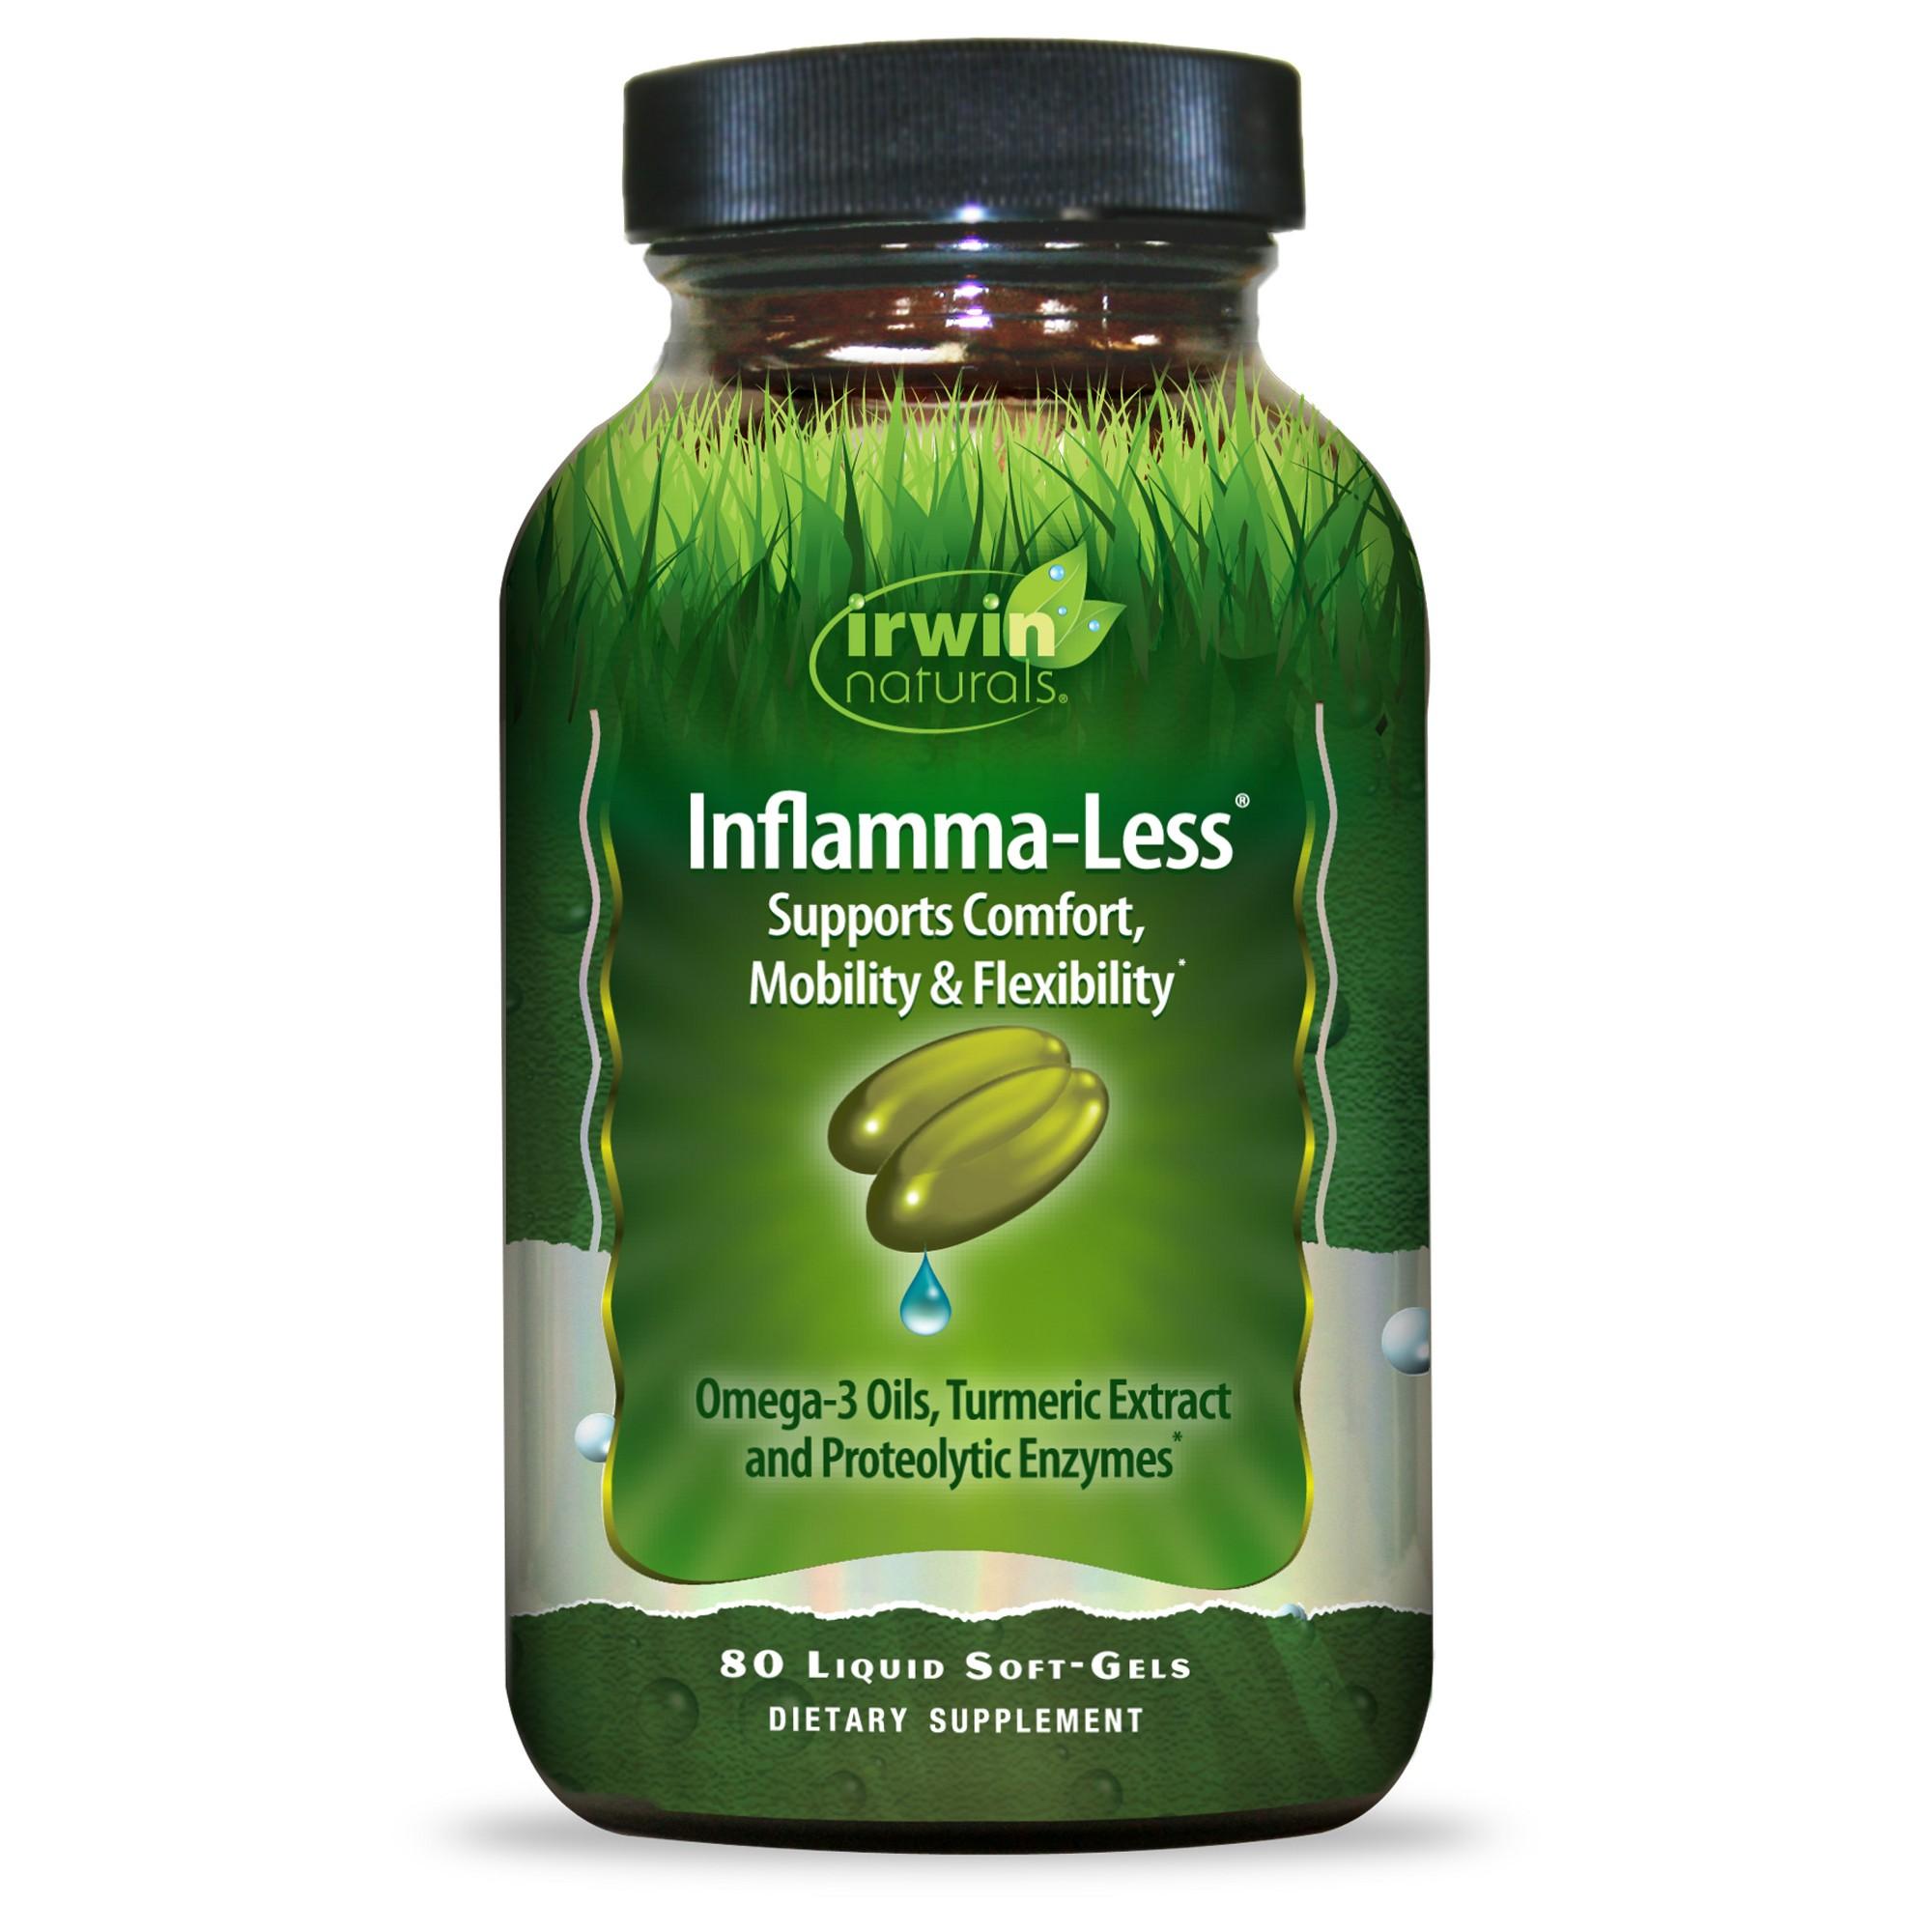 irwin naturals Inflamma-Less Dietary Supplement Li